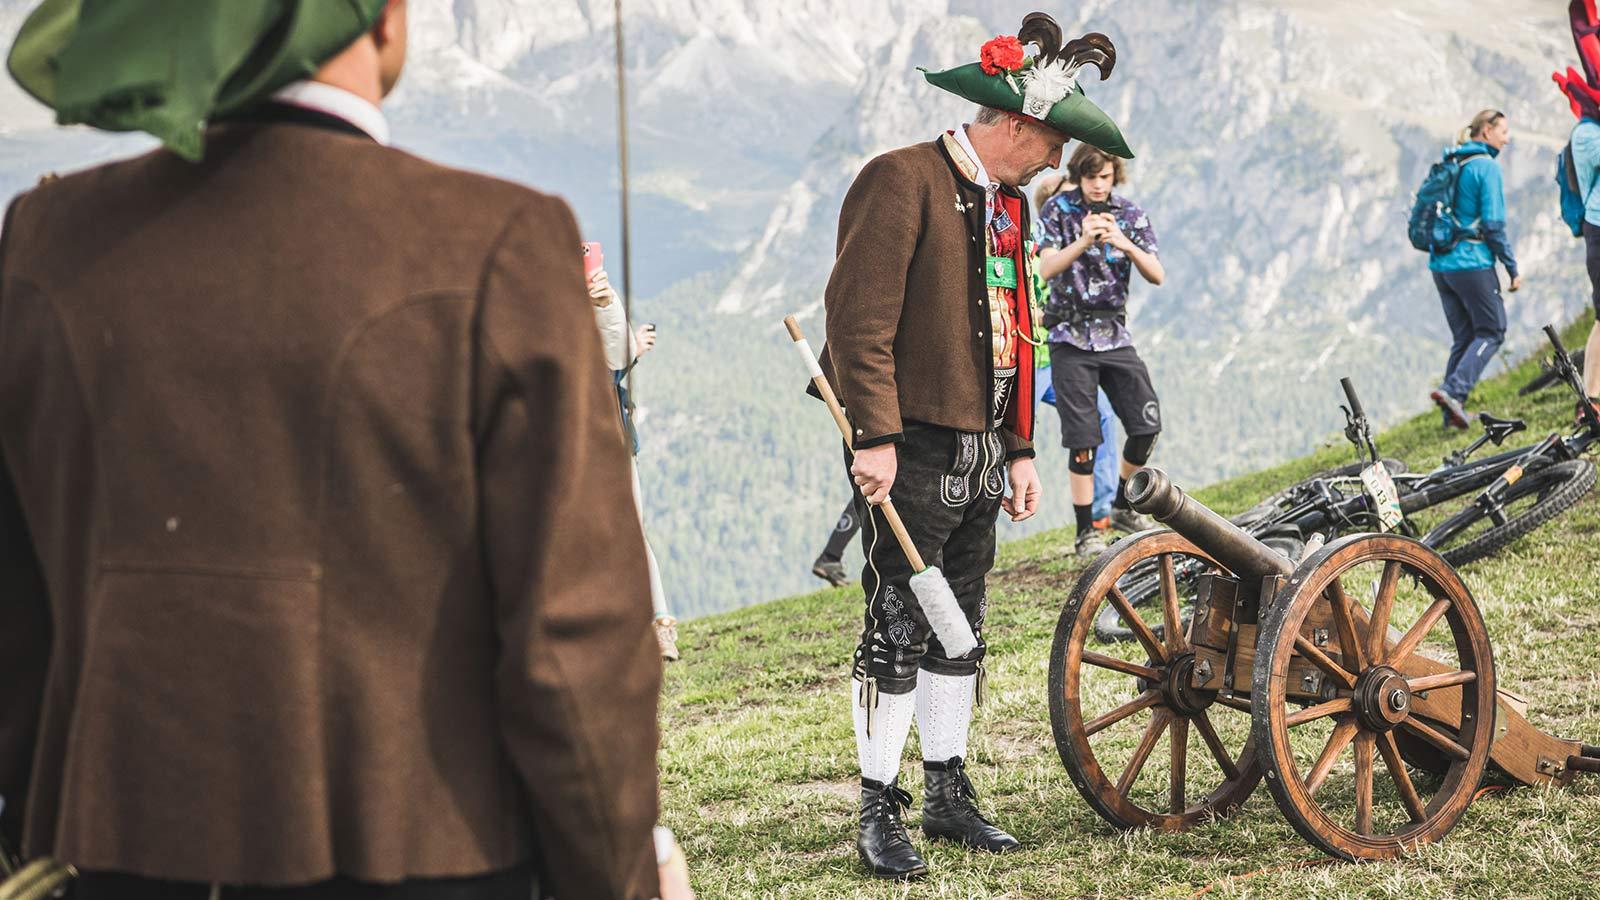 Event Knödeljagd 2021 Gröden Val Gardena - Kanonenschuß